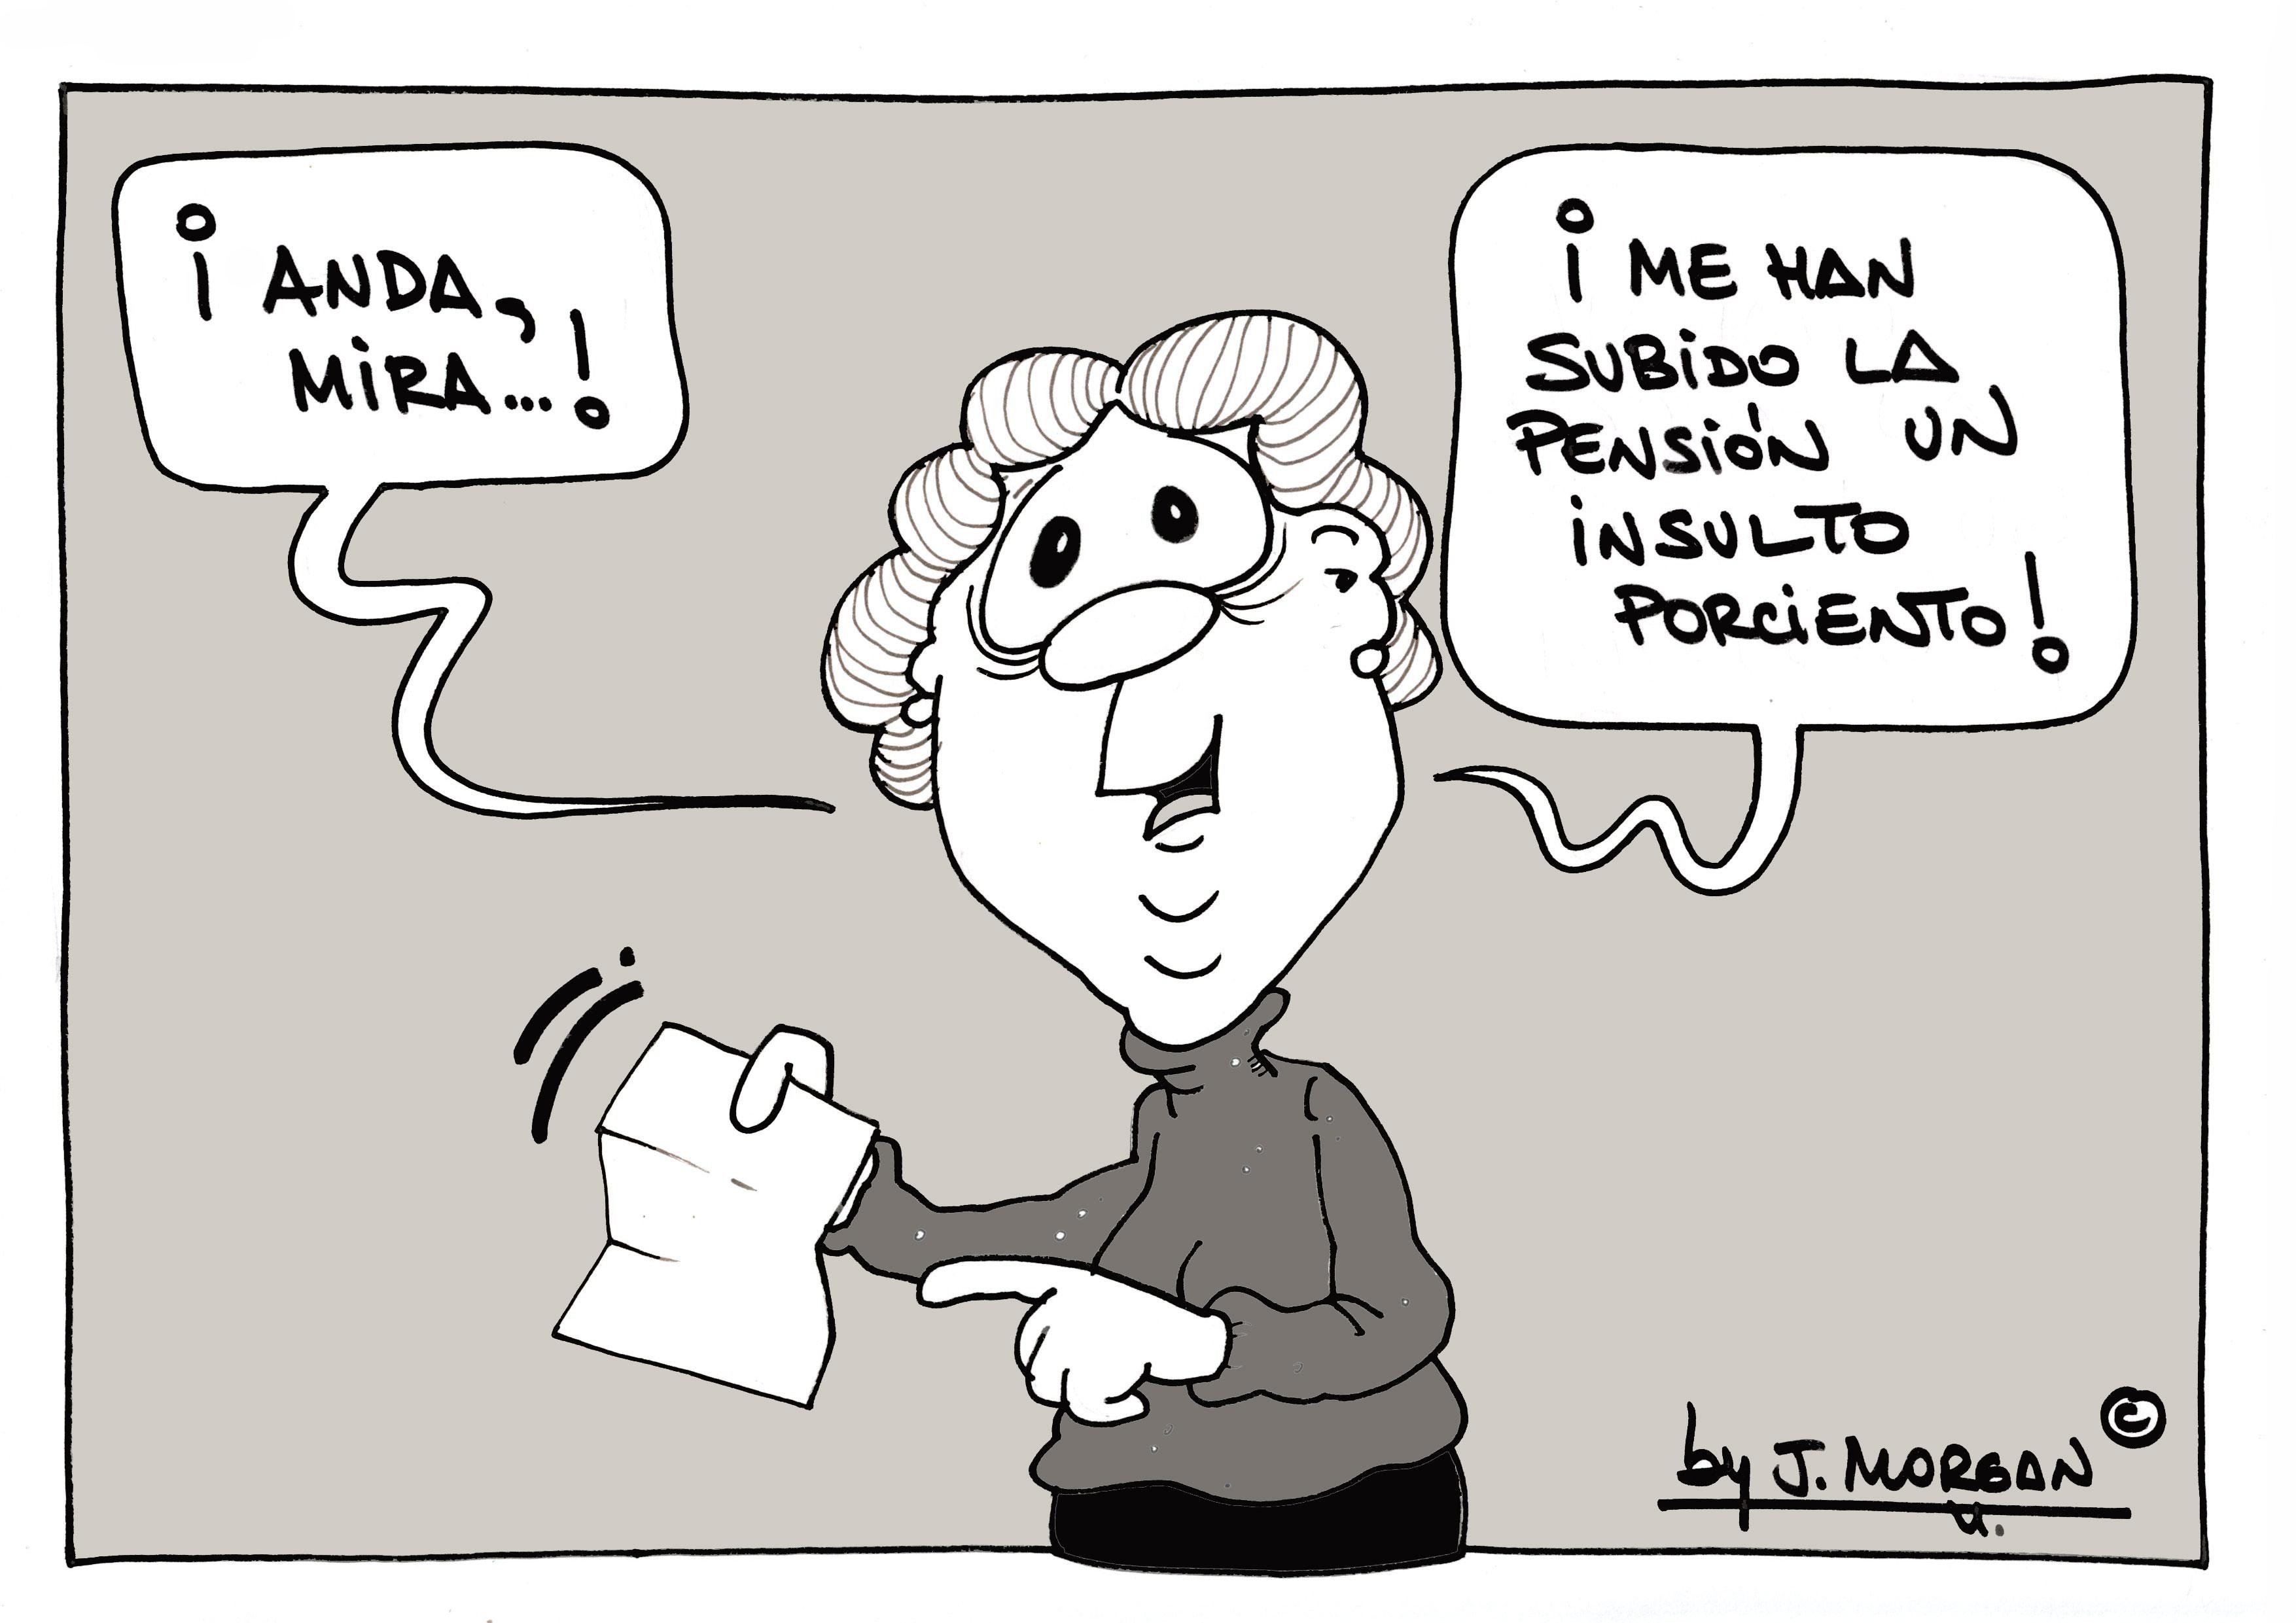 Viñetas de sátira social